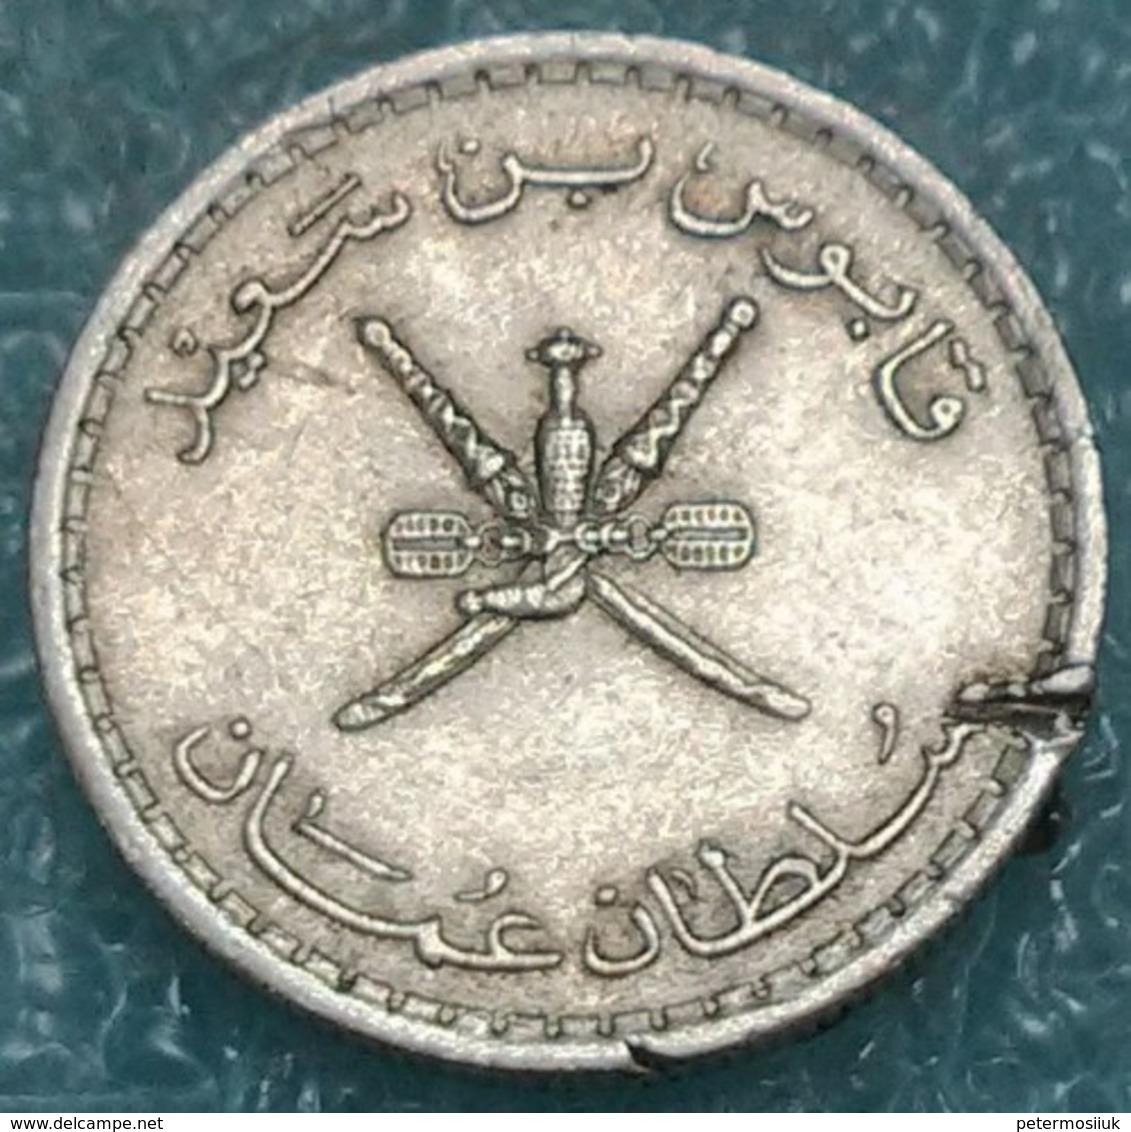 Oman 25 Baisa, 1406 (1985) -4432 - Oman